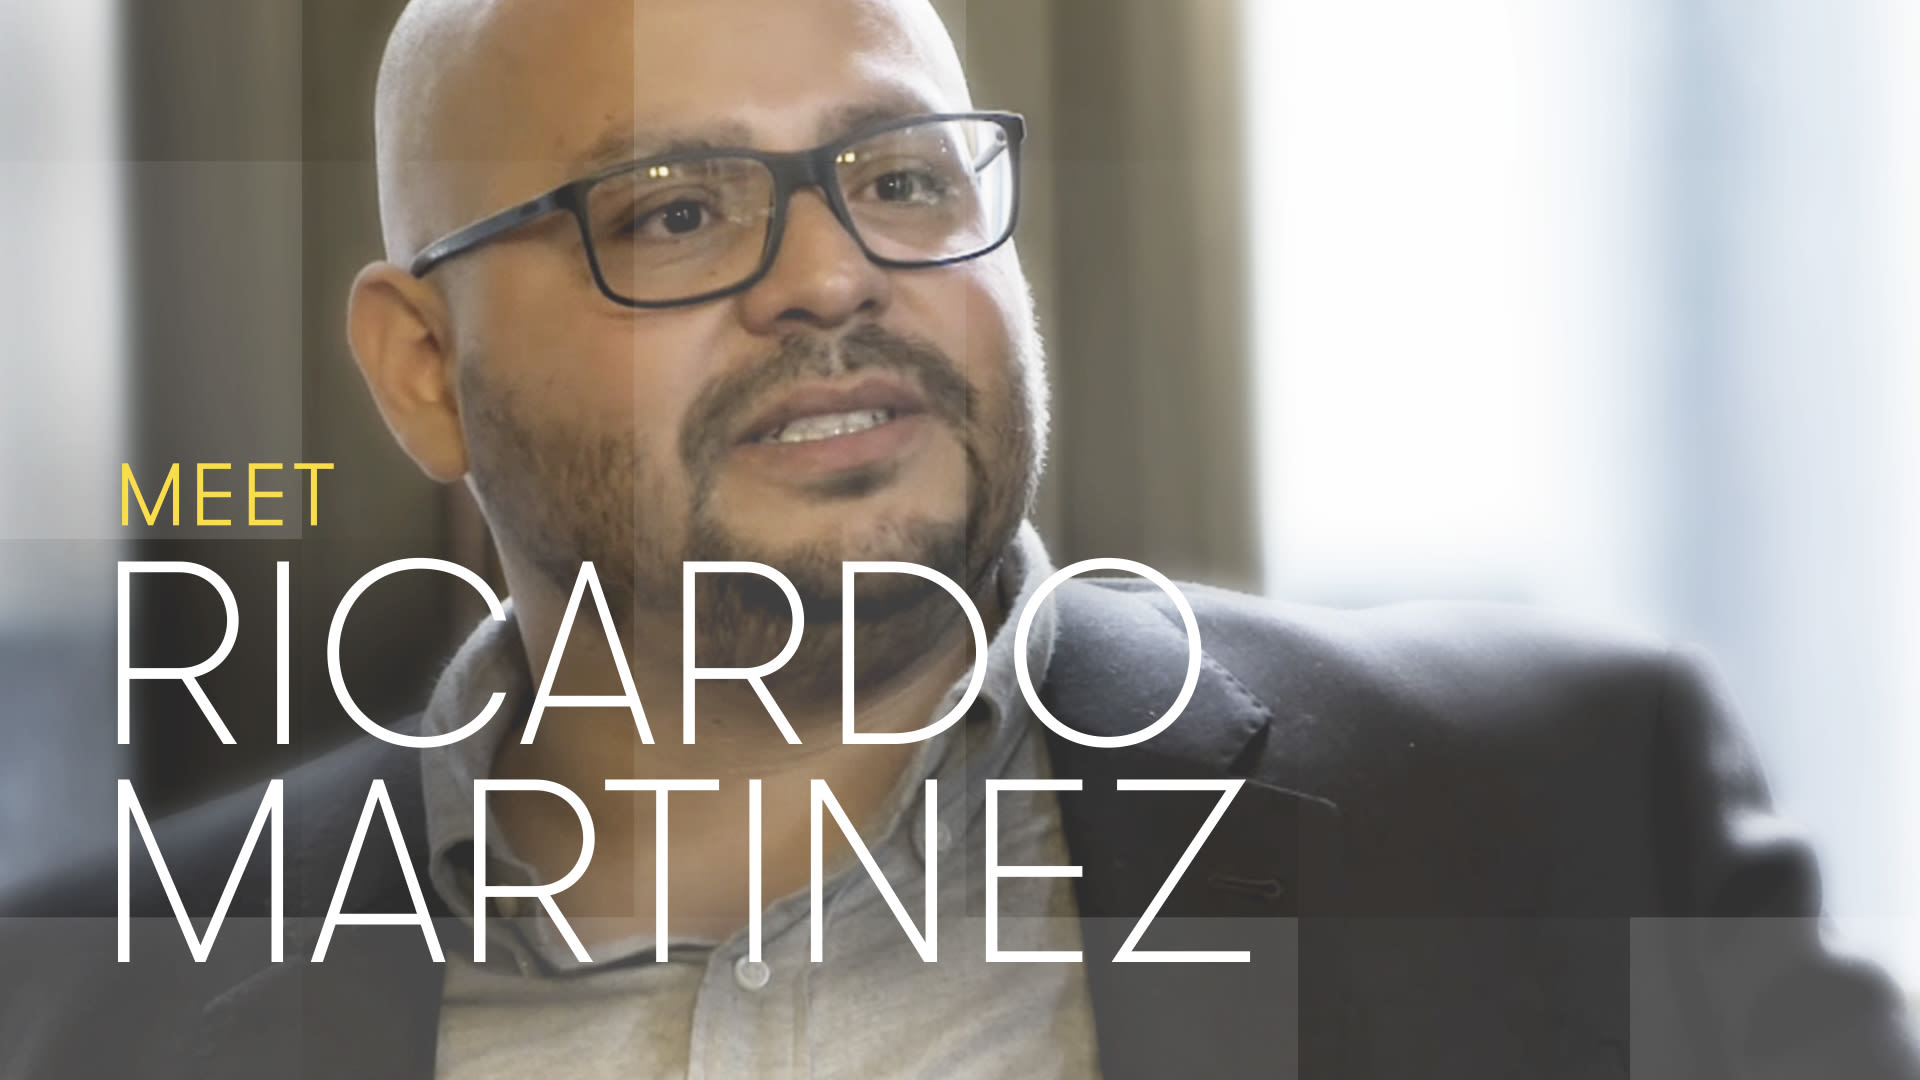 The Partner contestant Ricardo Martinez